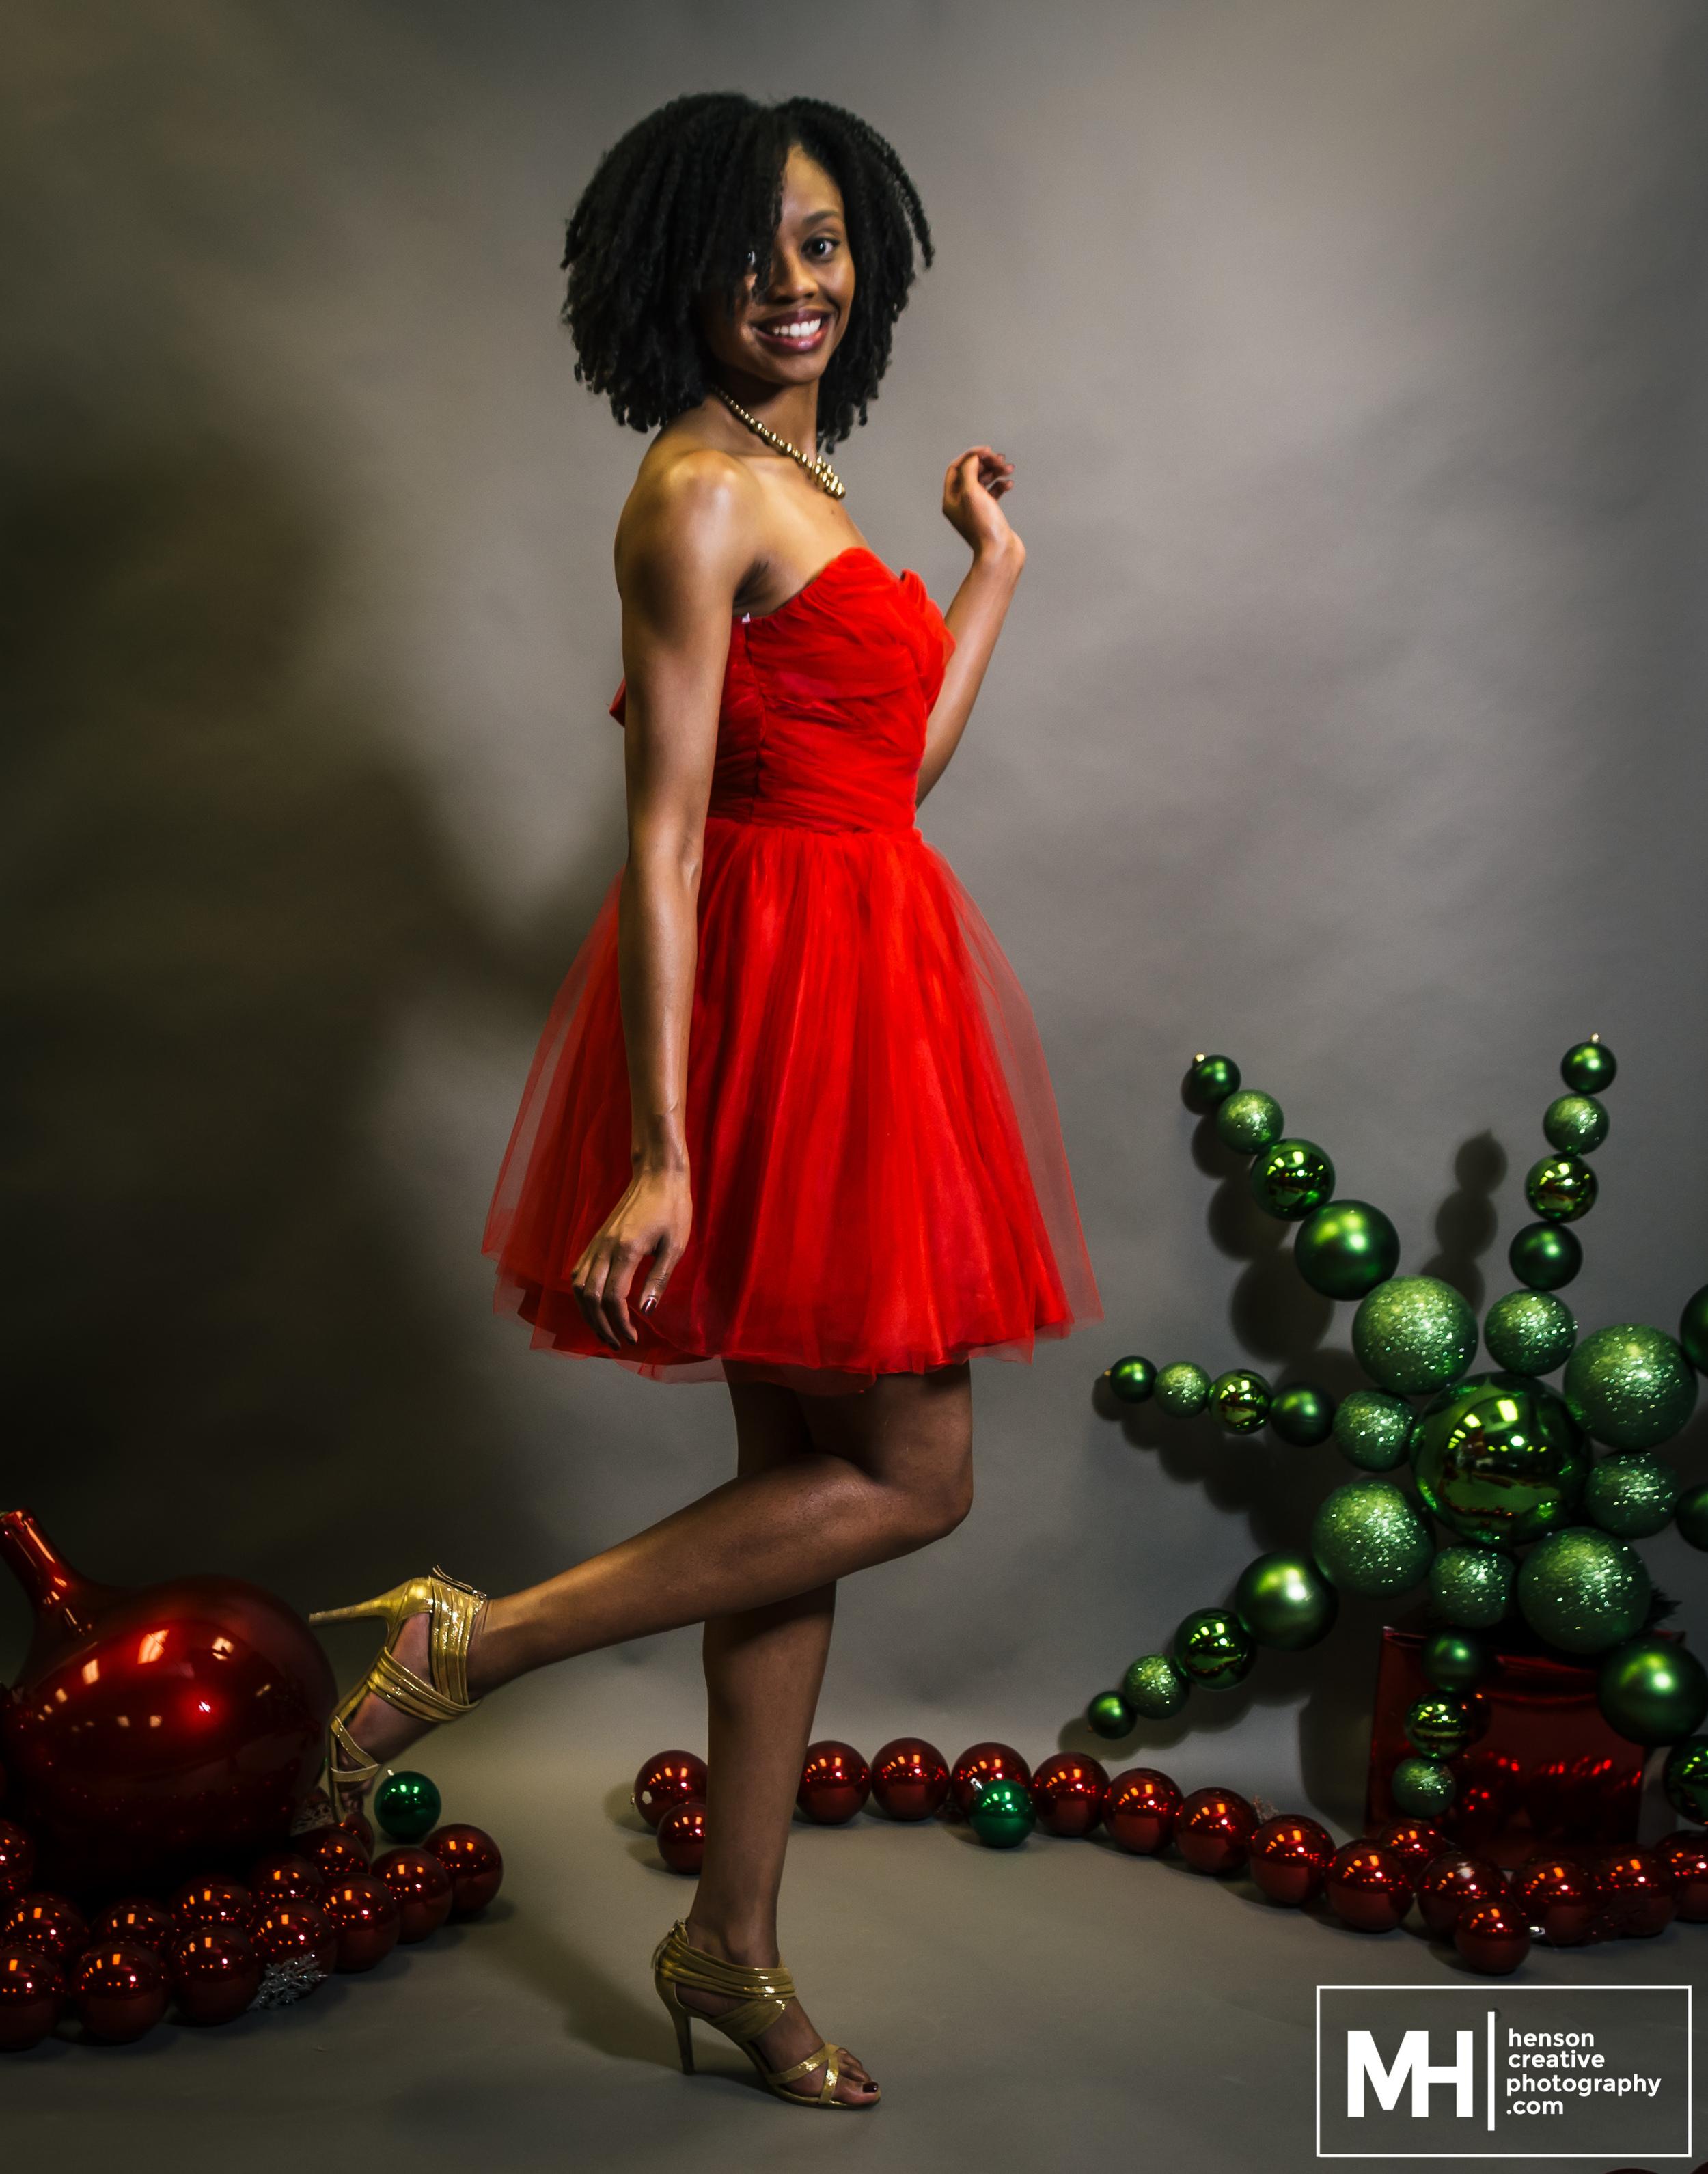 Refresh - ModeloftheMonth - December - St. Louis Fashion Photographer - Henson Creative(AfterRetouch)-1.jpg